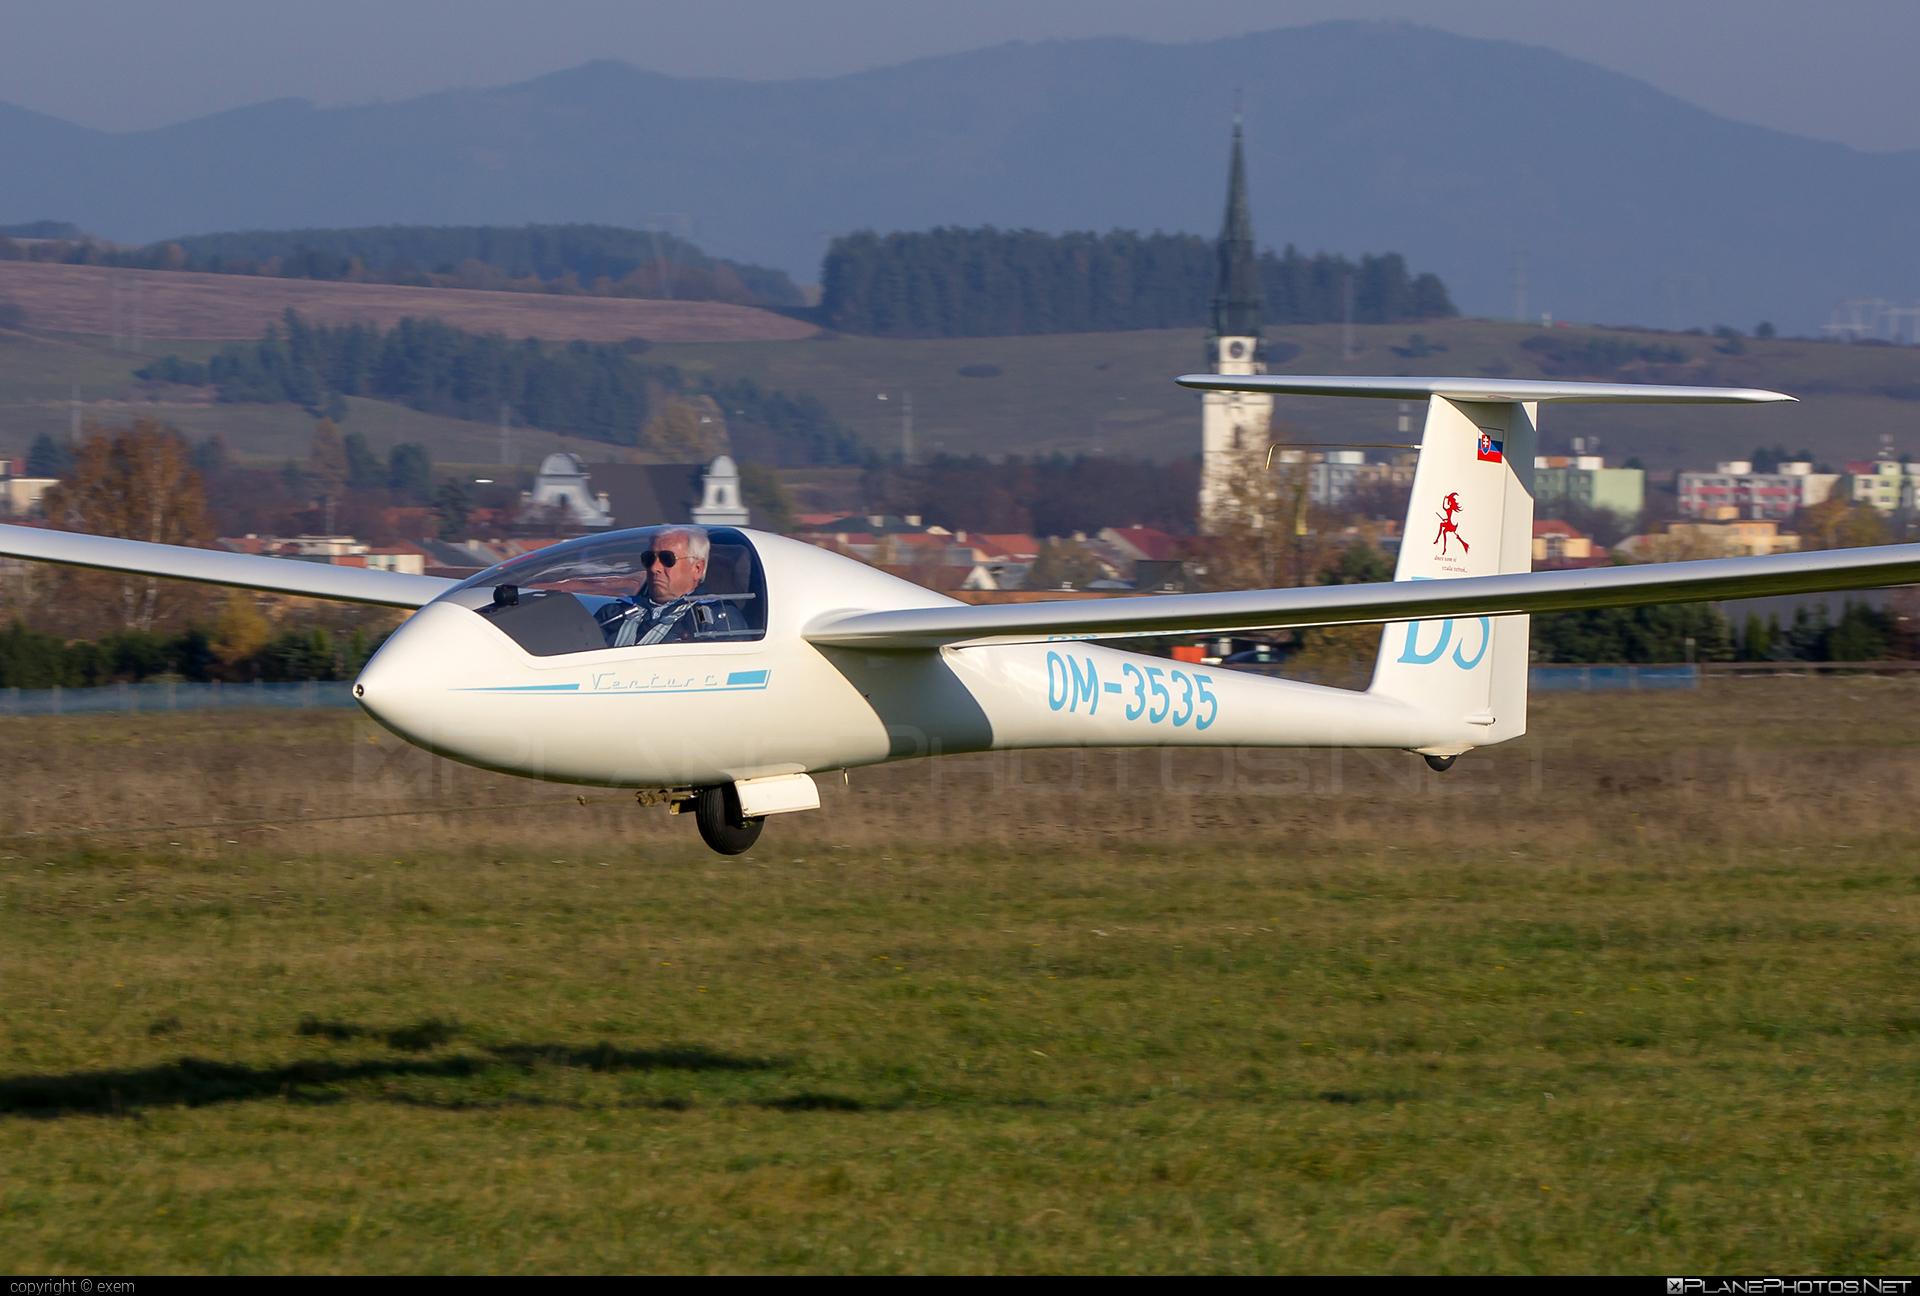 Schempp-Hirth Ventus c - OM-3535 operated by Private operator #schempphirth